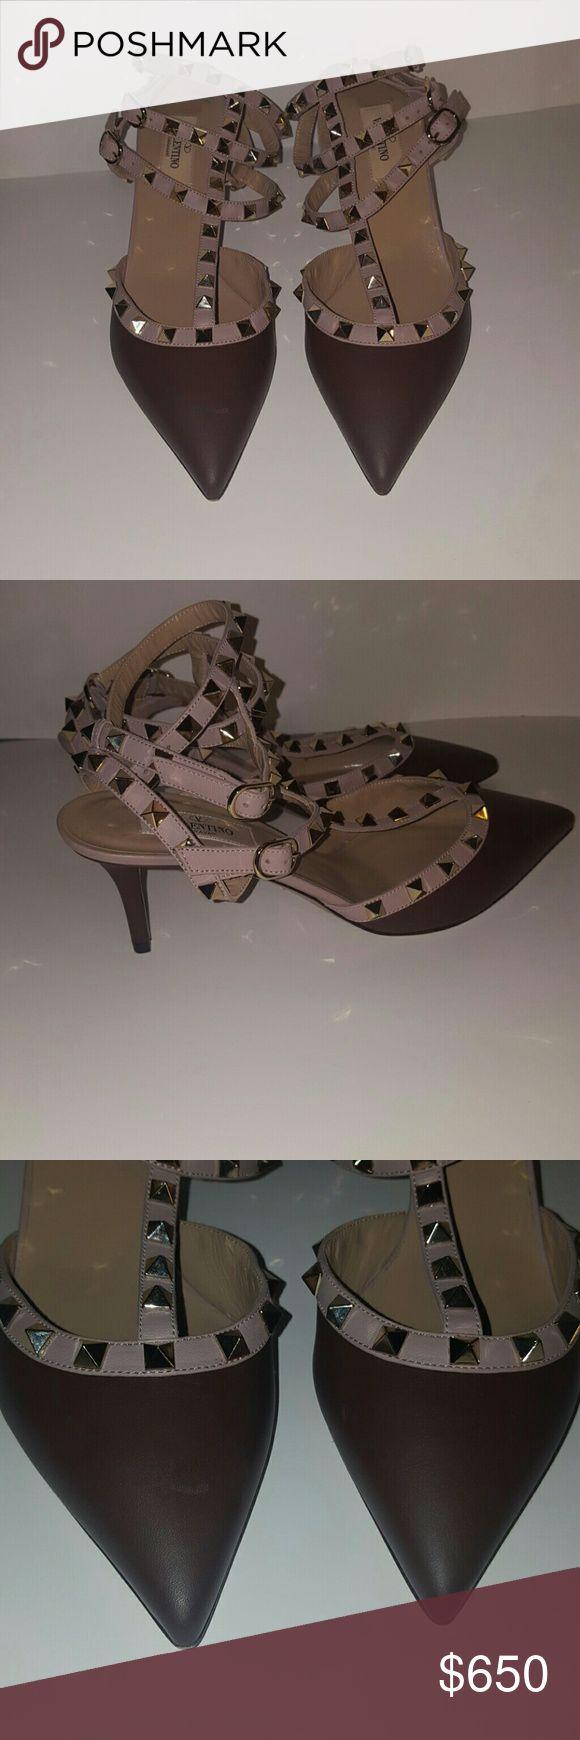 Valentino rock stud heels Brand New No Duster No box Valentino Shoes Heels